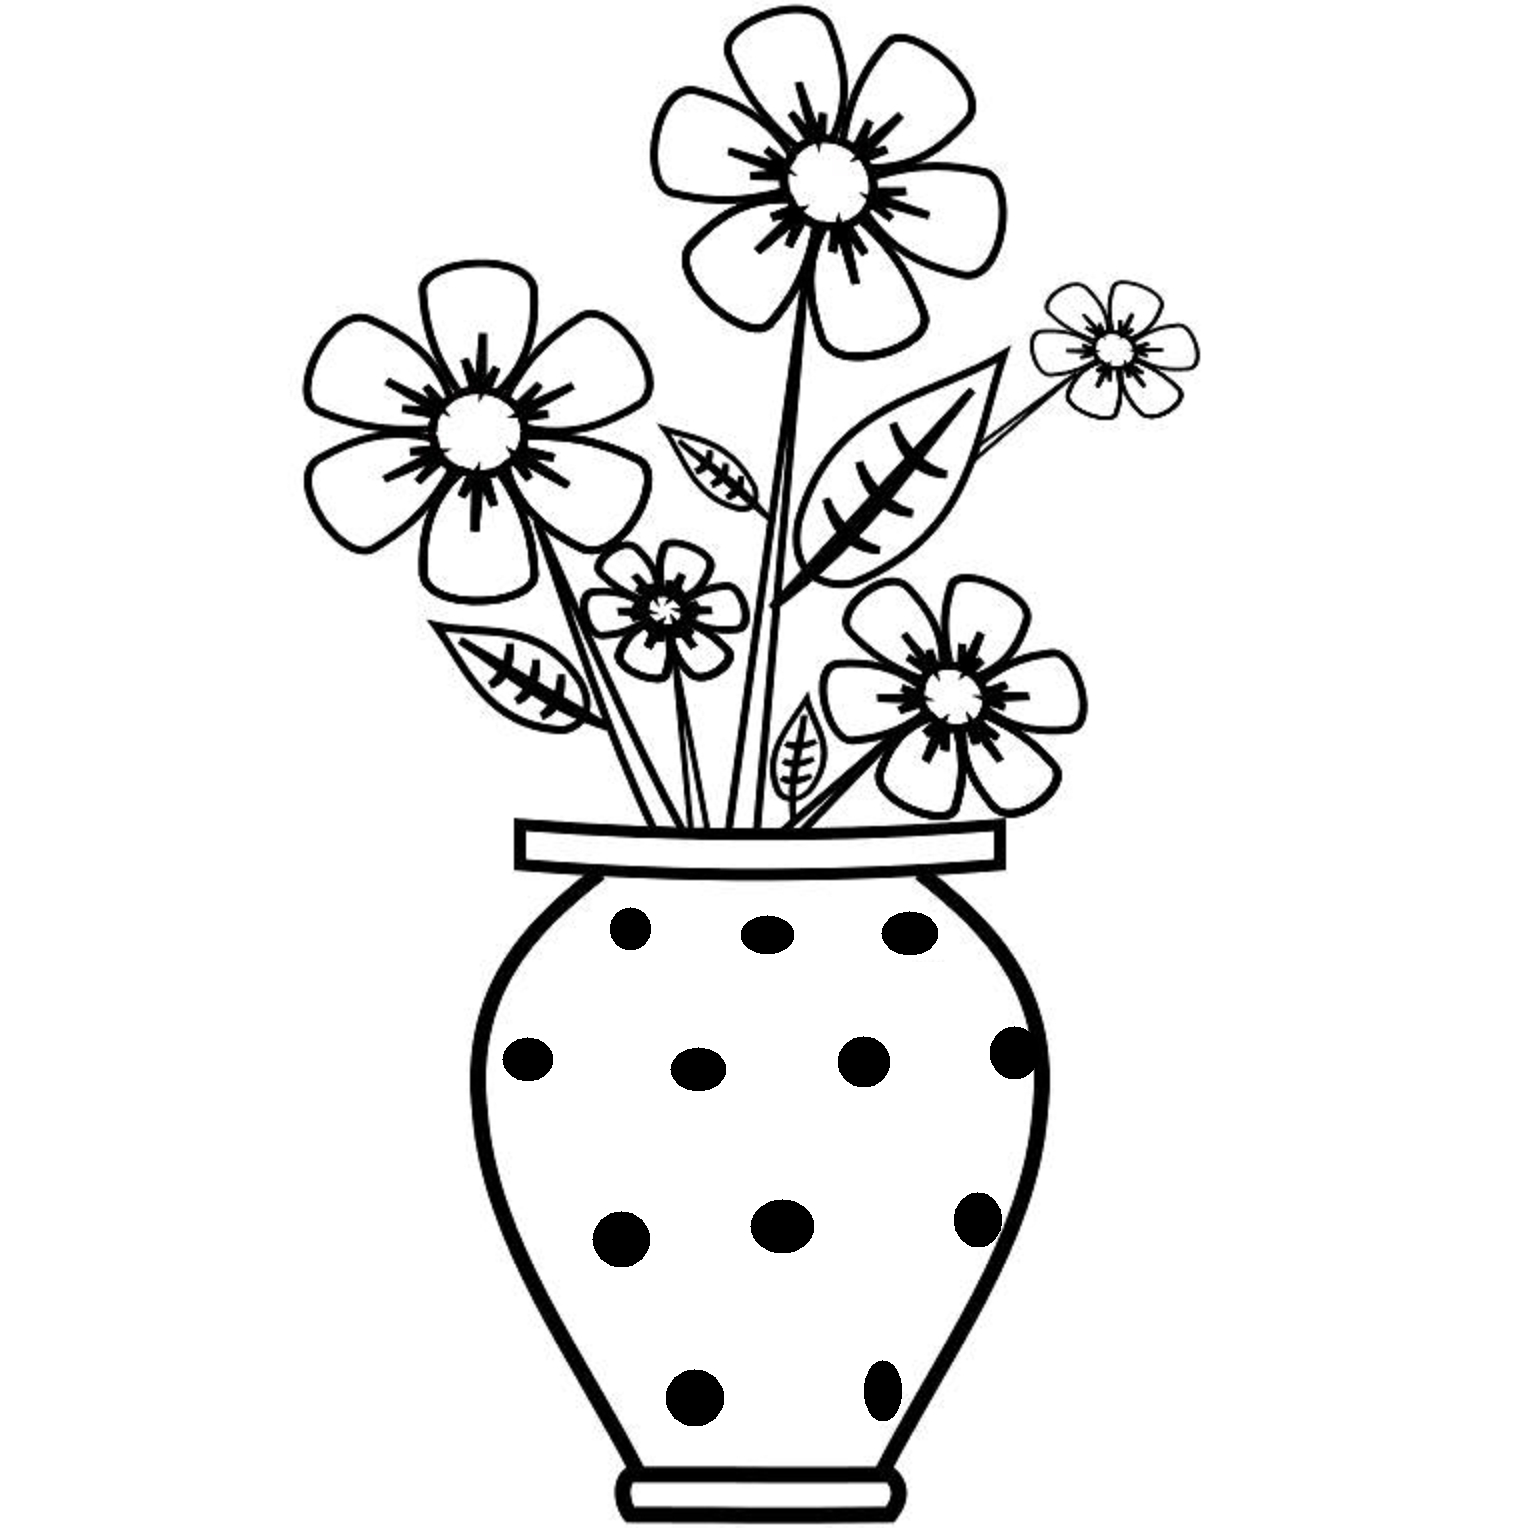 1532x1528 Draw A Flower Vase For Kids